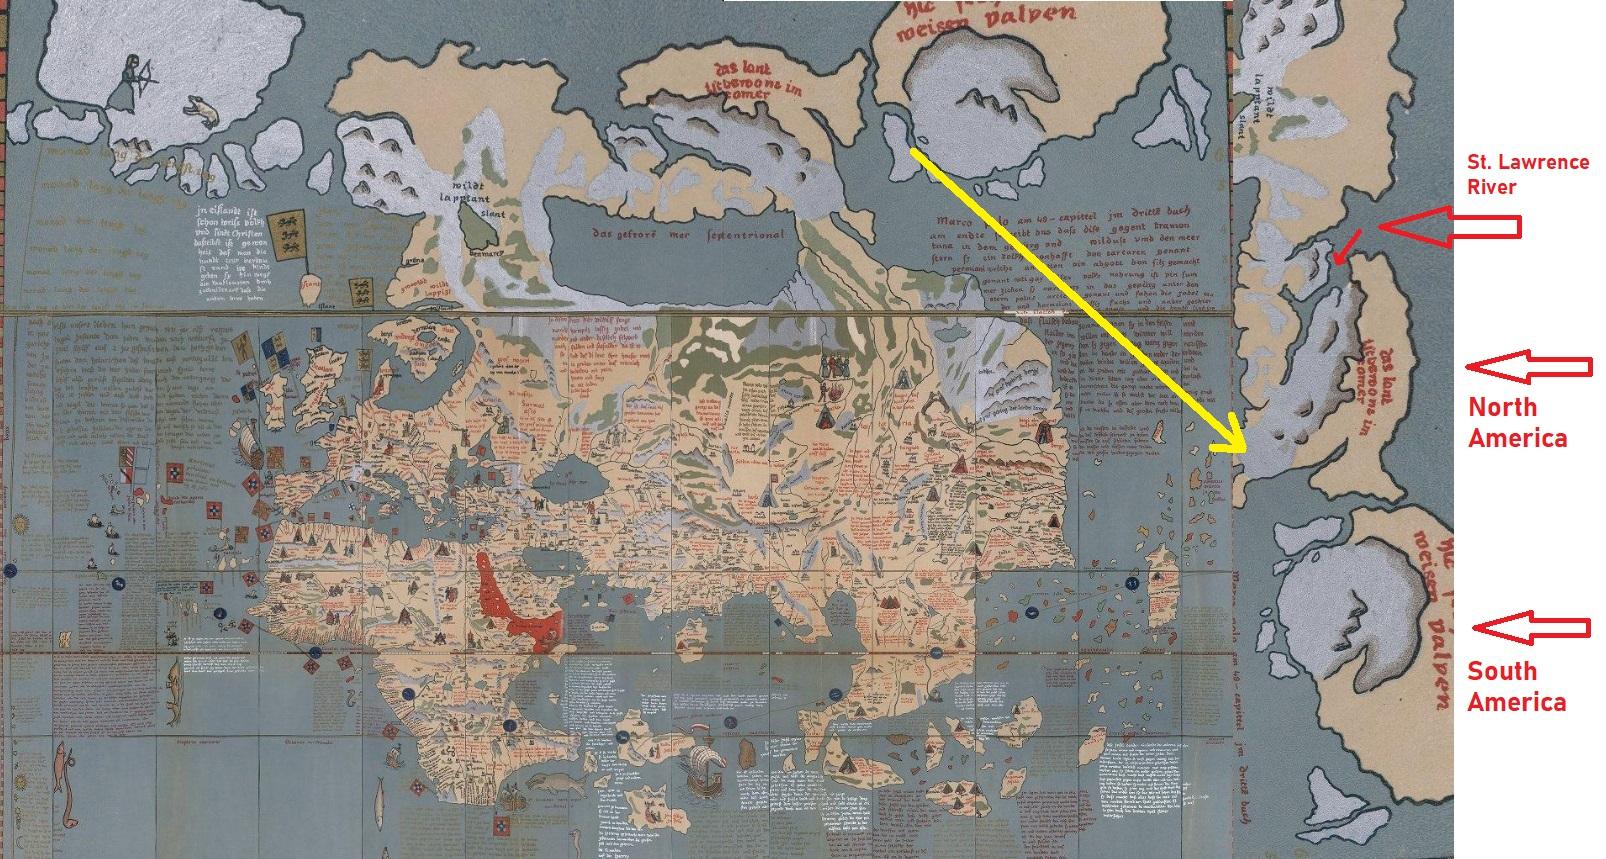 Martin_beh-map2.jpg